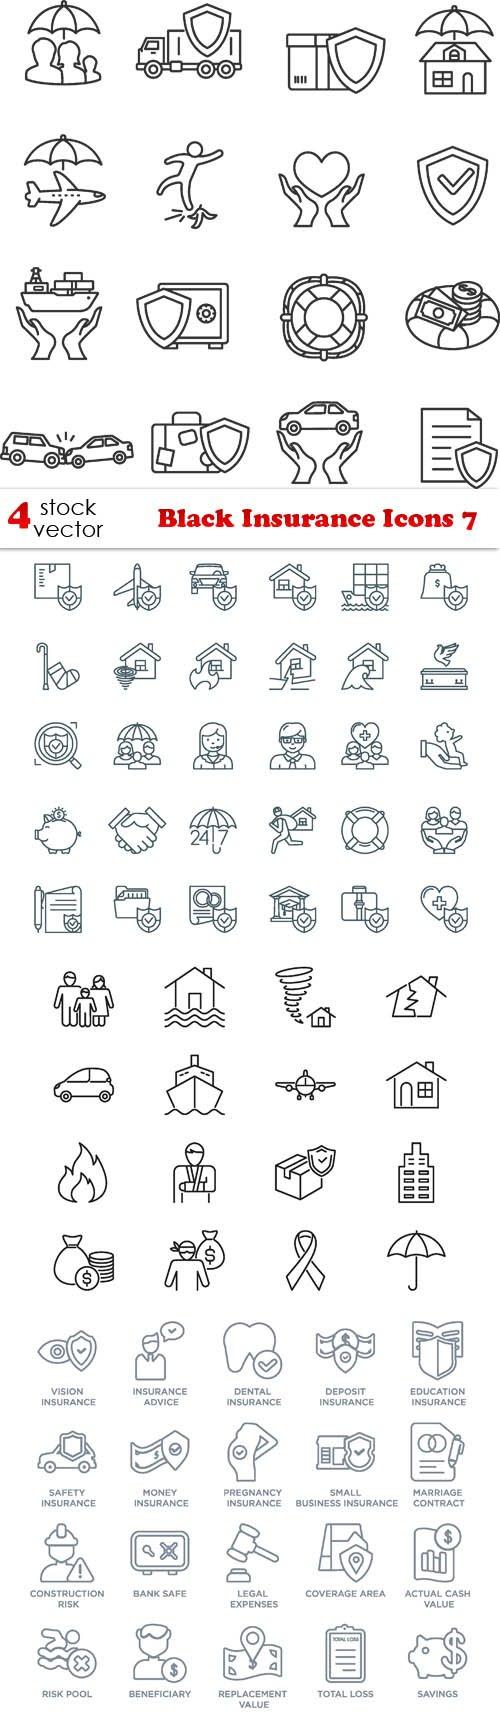 Vectors - Black Insurance Icons 7